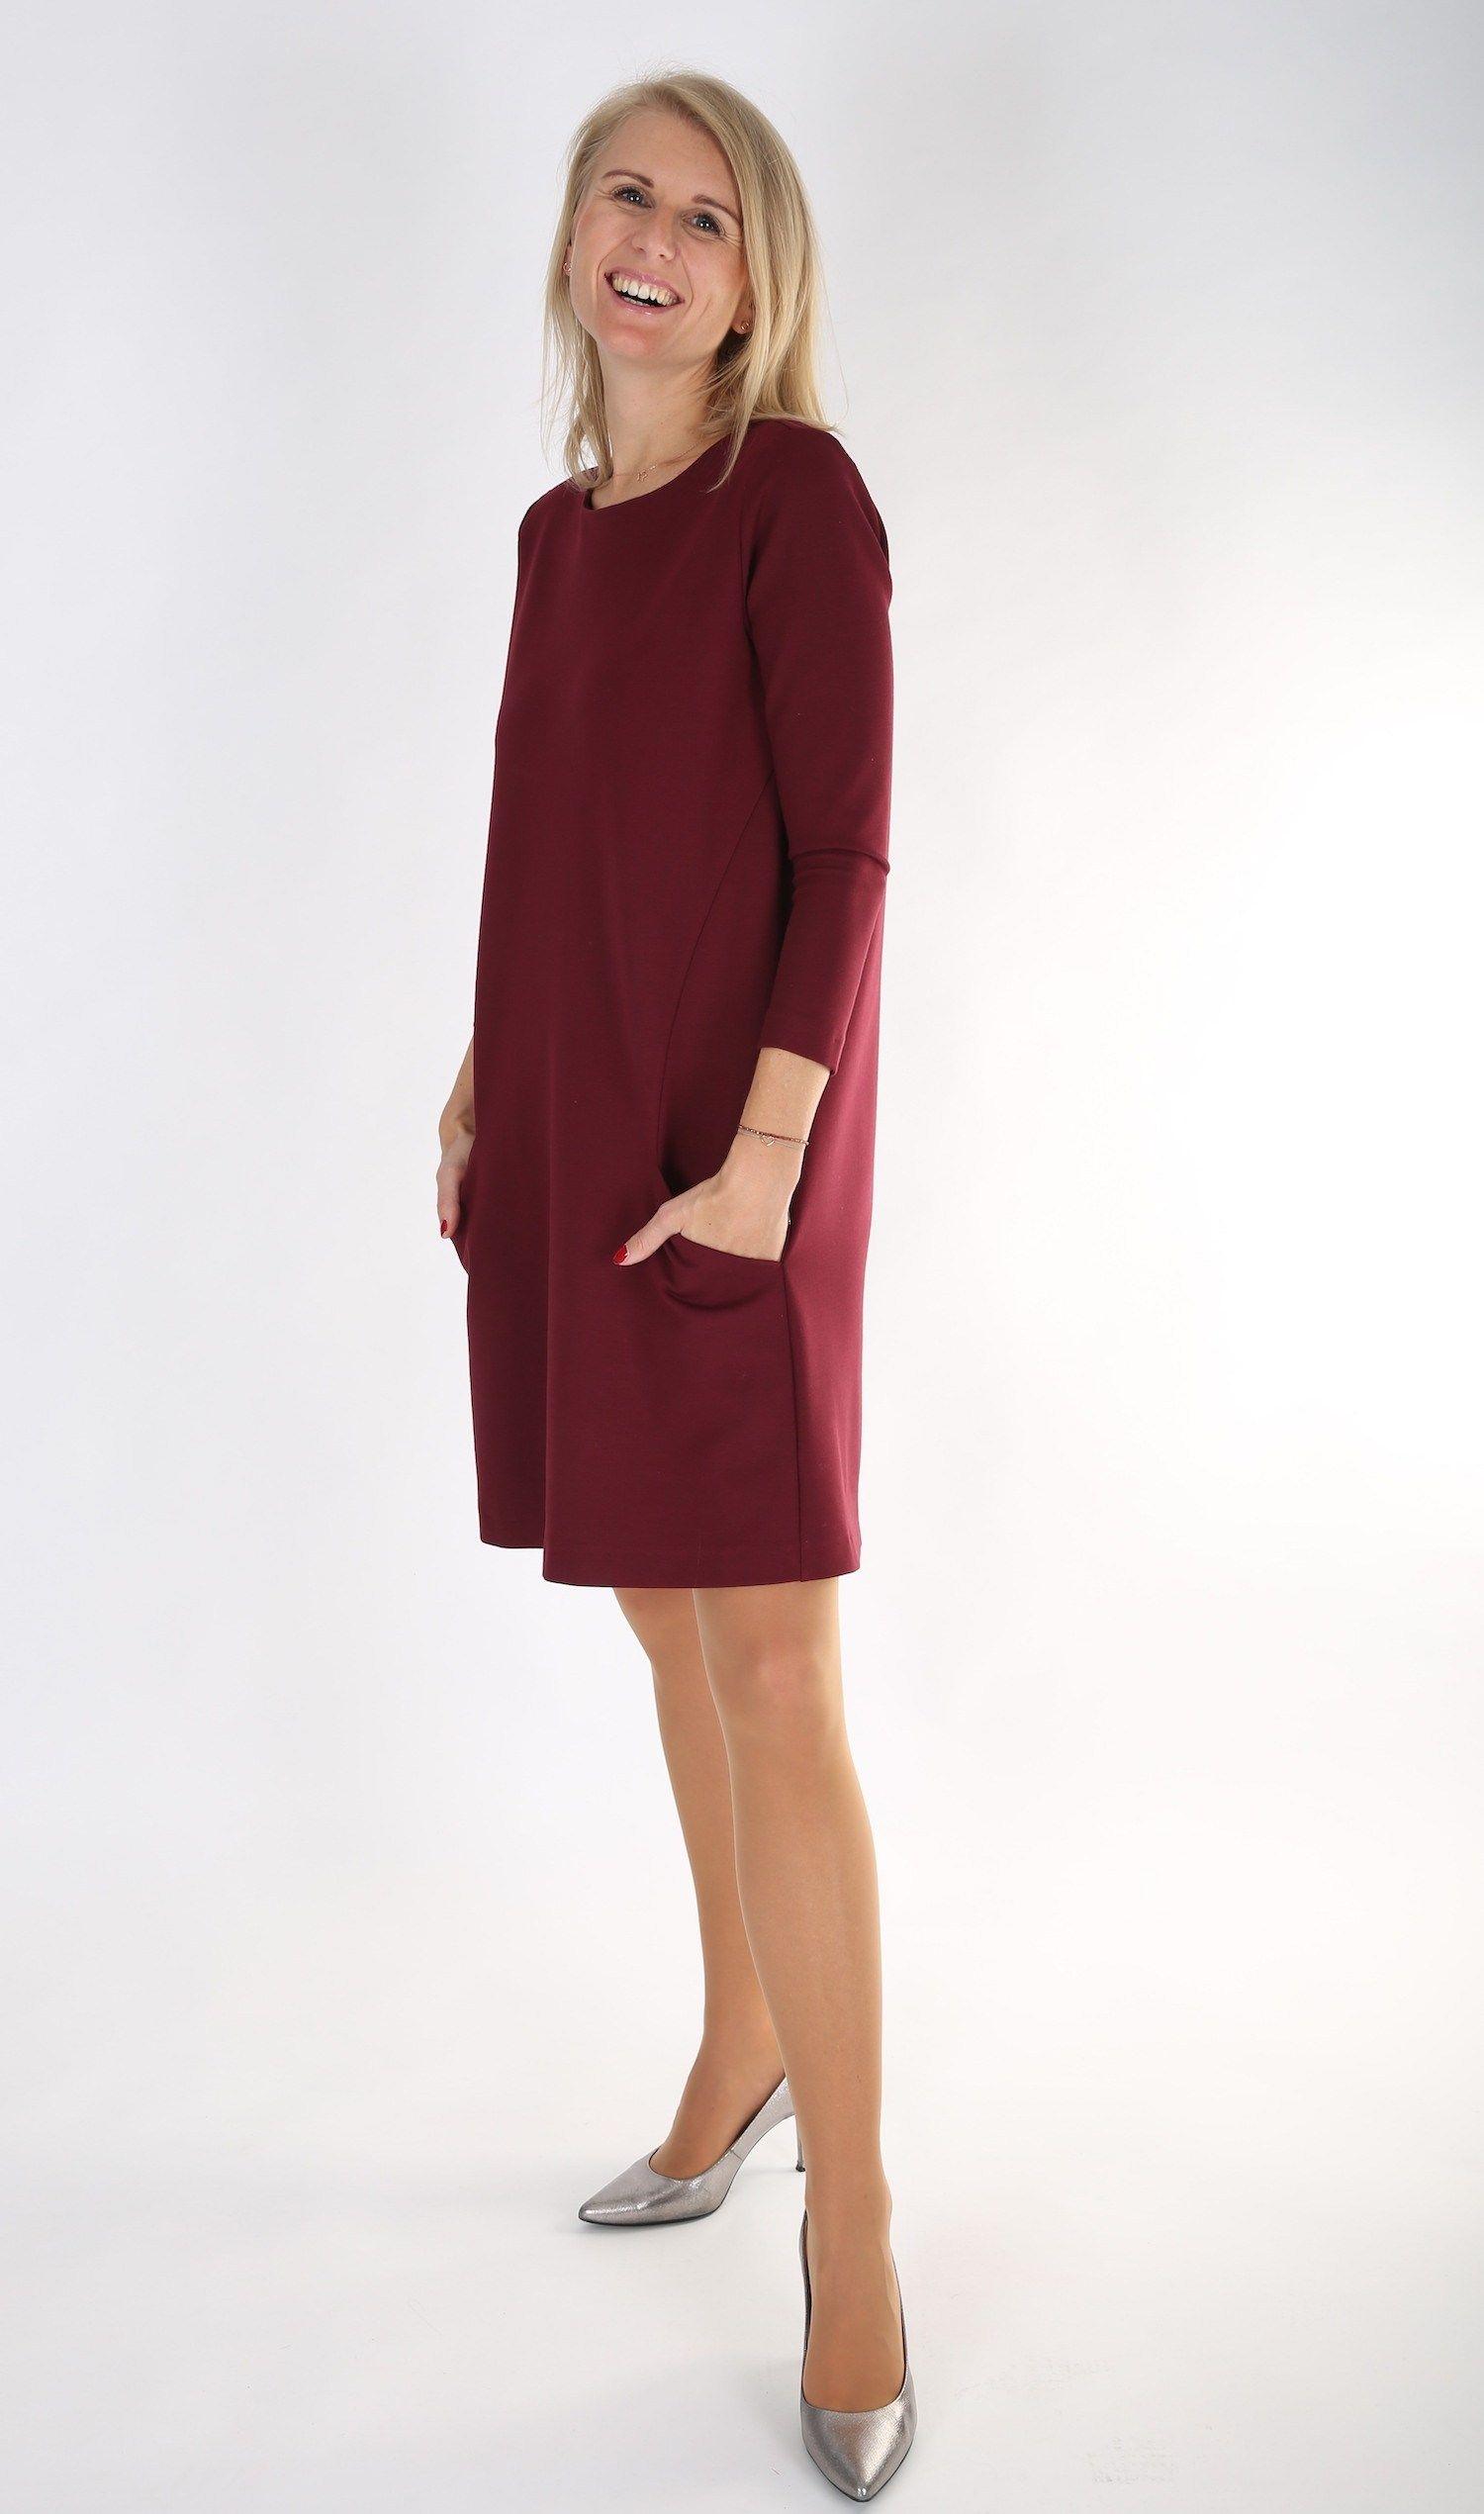 DawandaDamen1 | Kleid nähen, Kostenloses schnittmuster